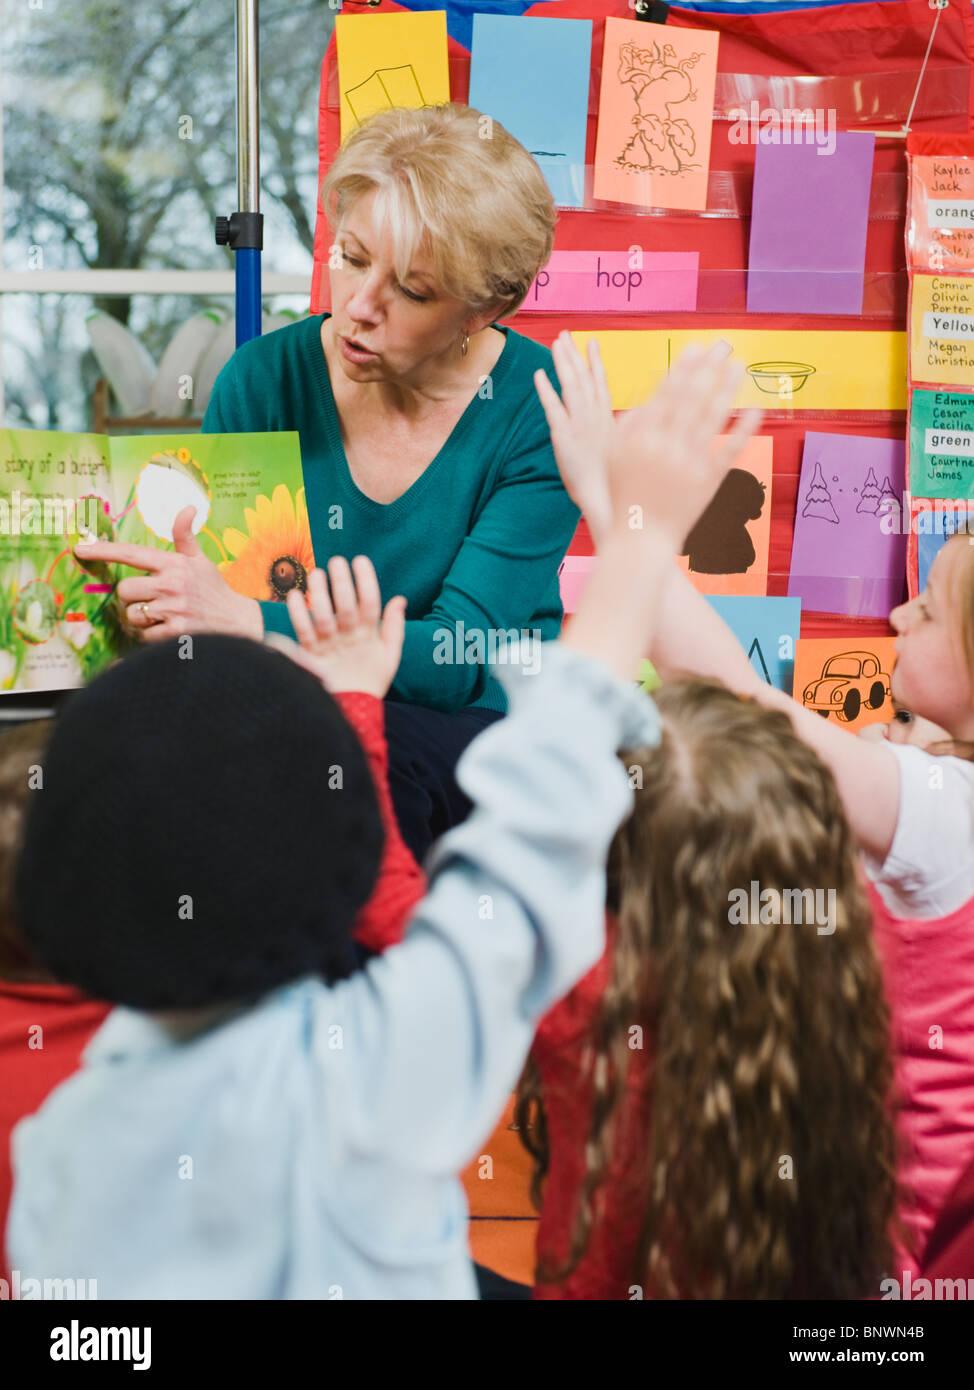 Elementary school teacher reading book to students - Stock Image